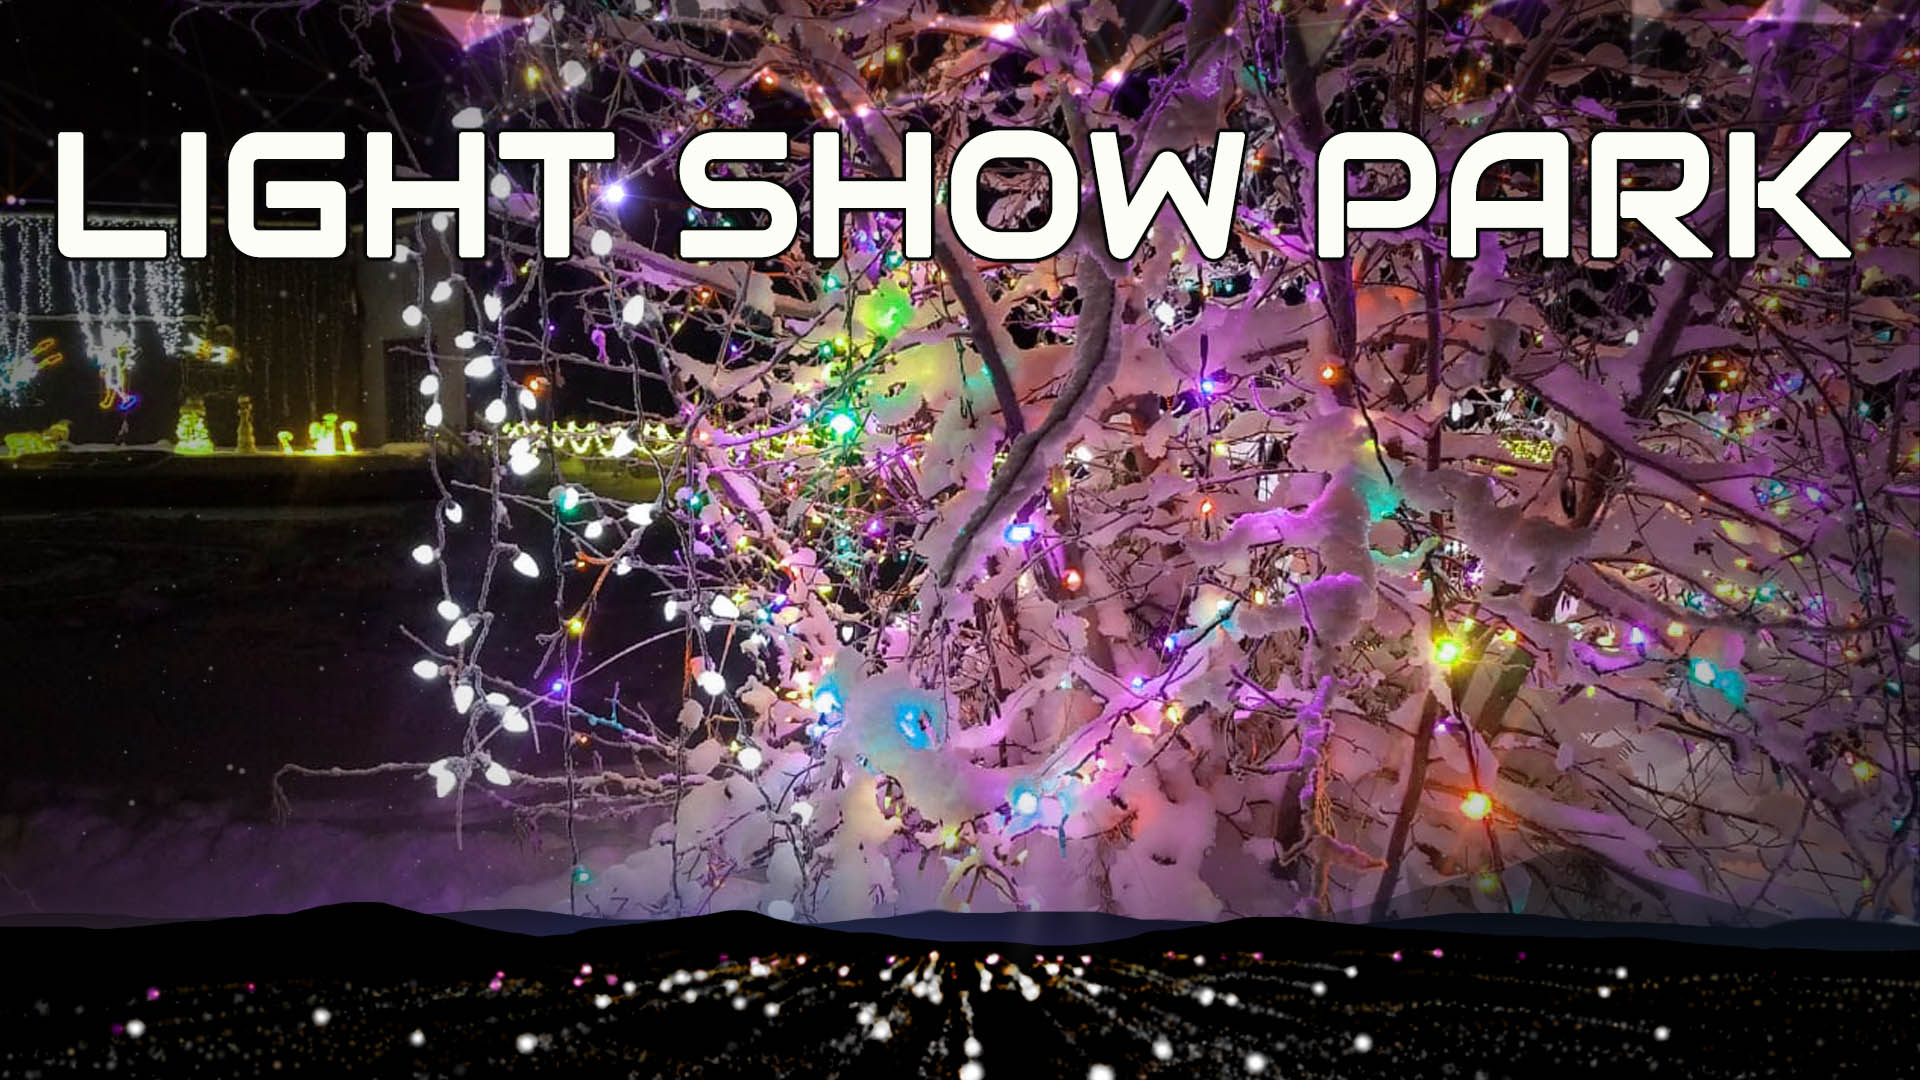 LIGHT SHOW ICE PARK.jpg